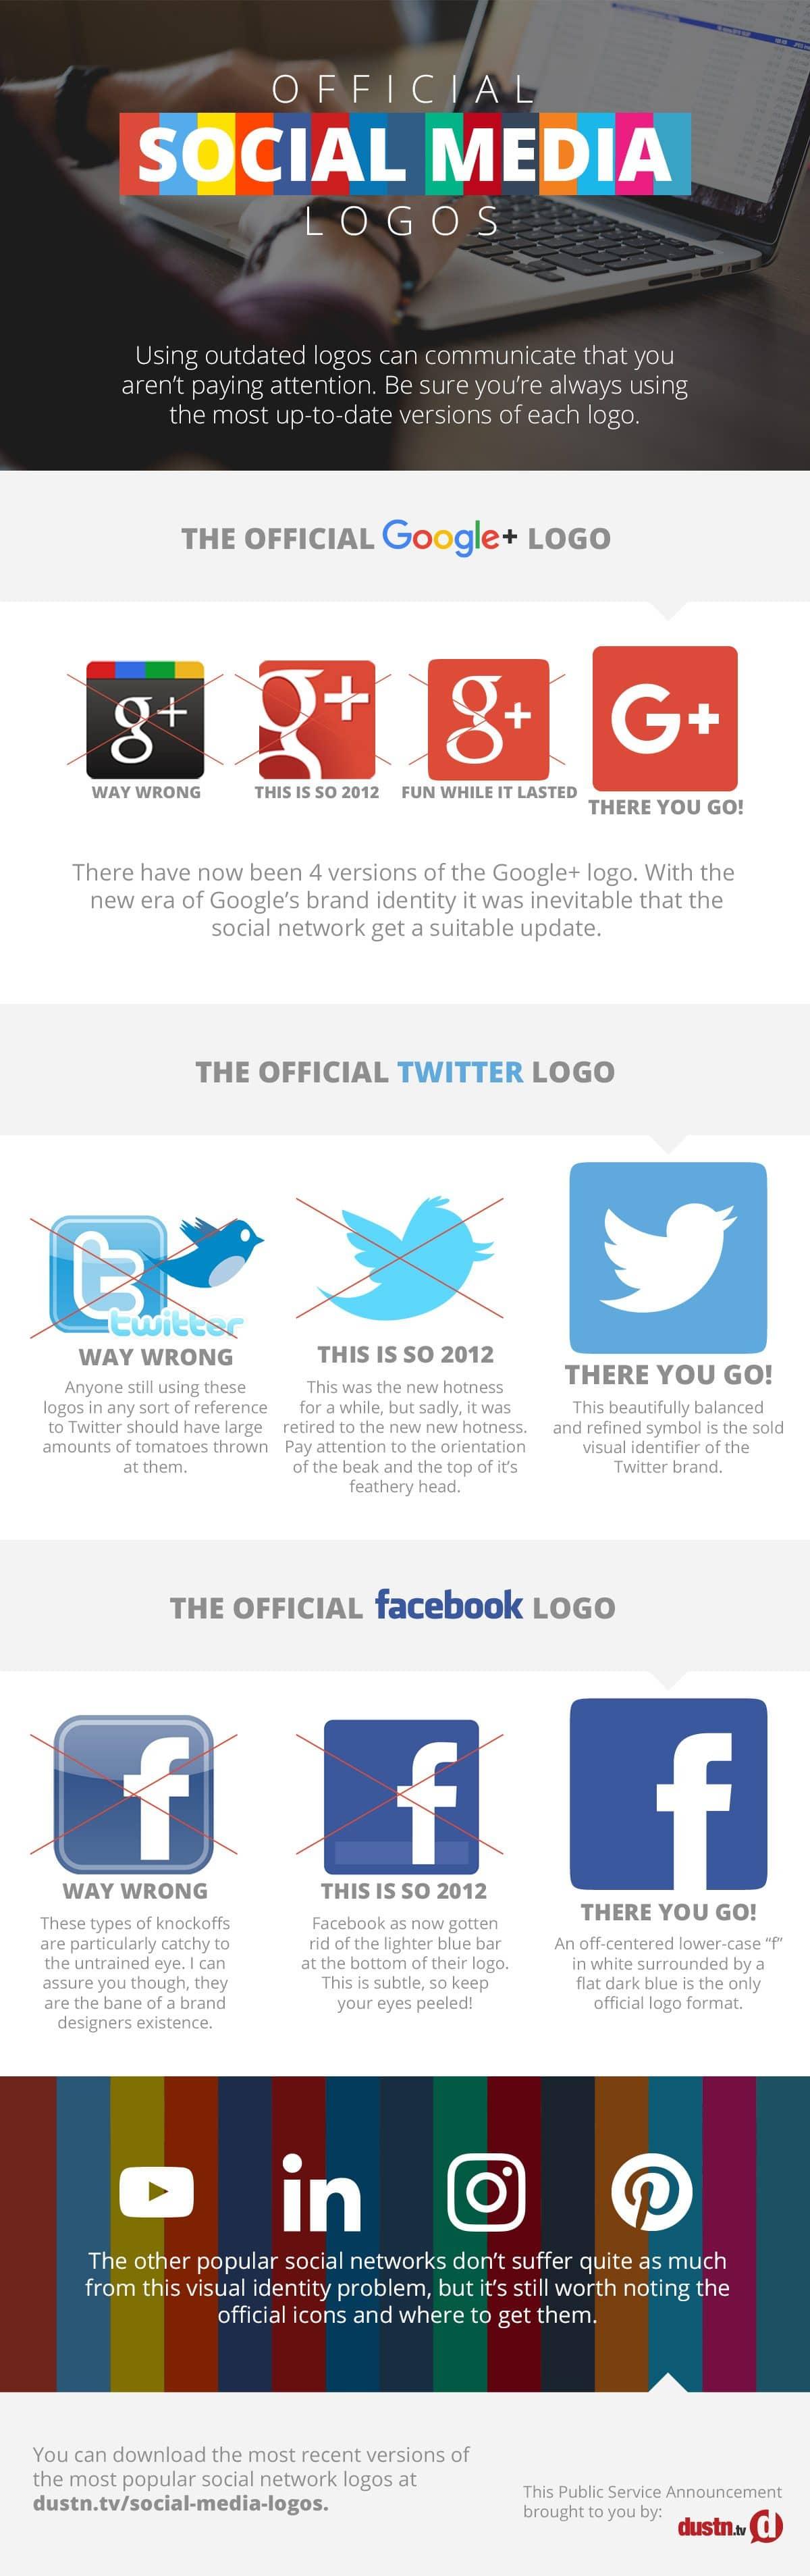 Official Social Media Logos Infographic